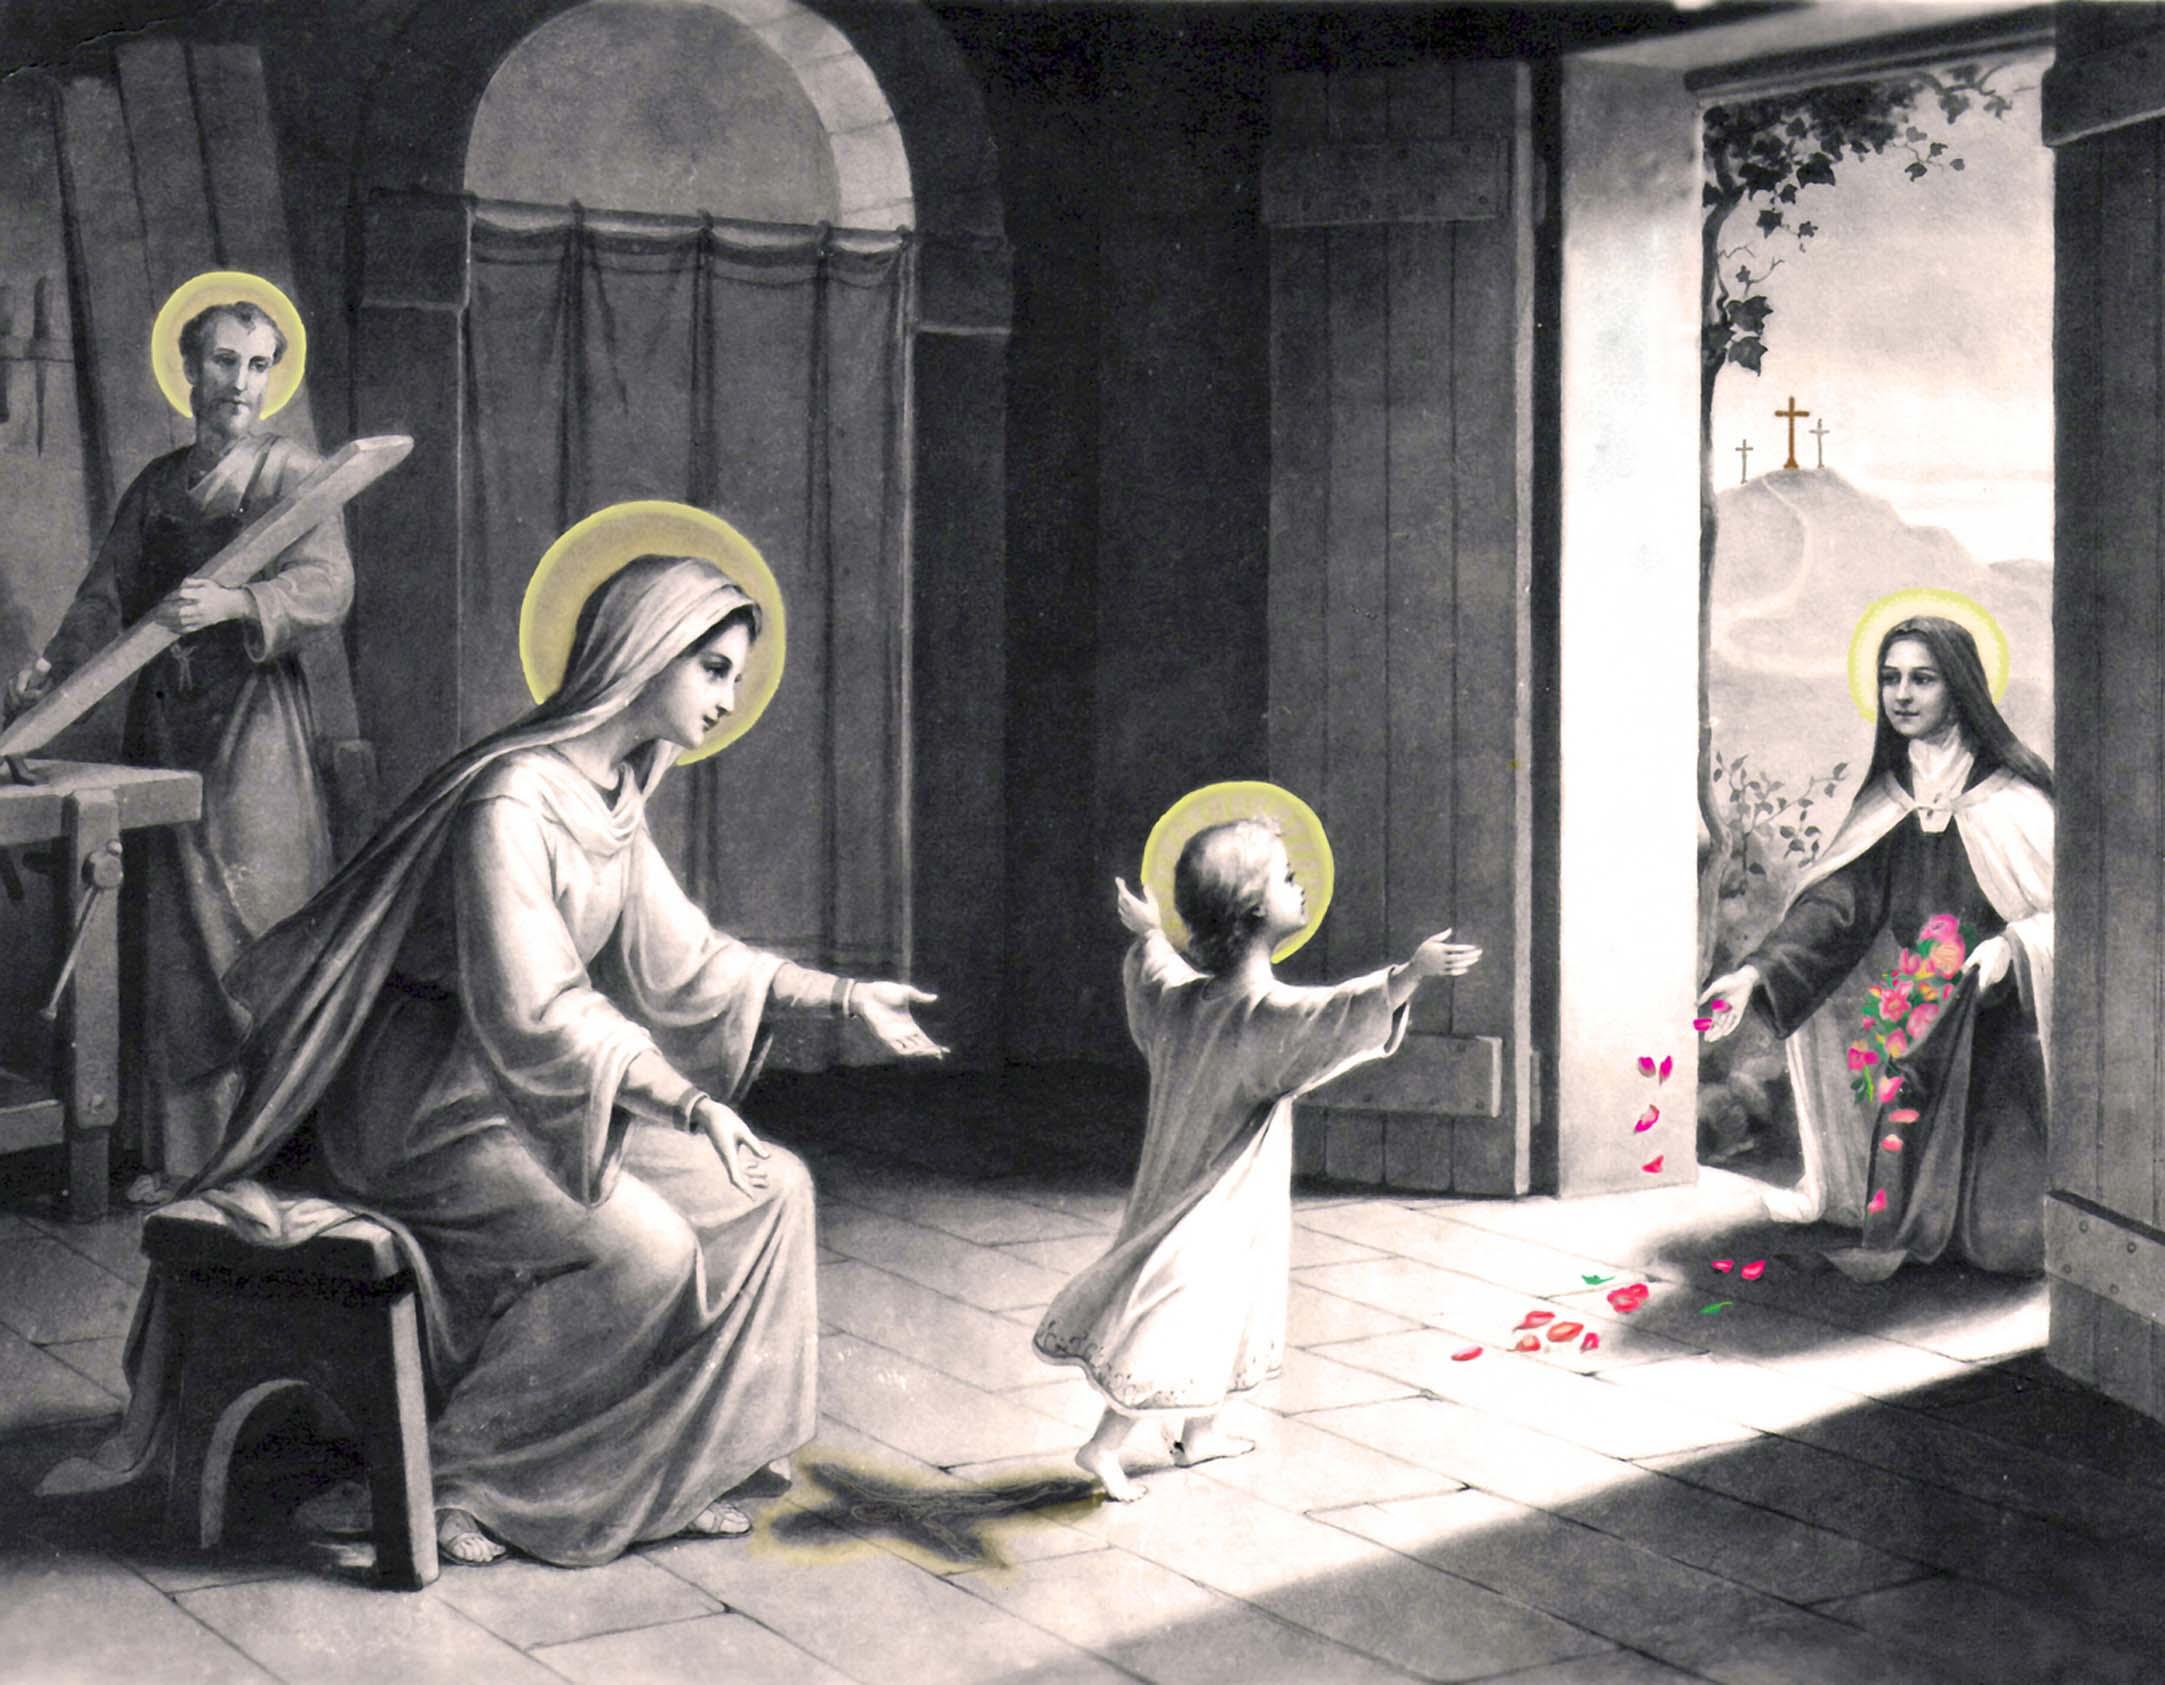 Therese-nazareth - web